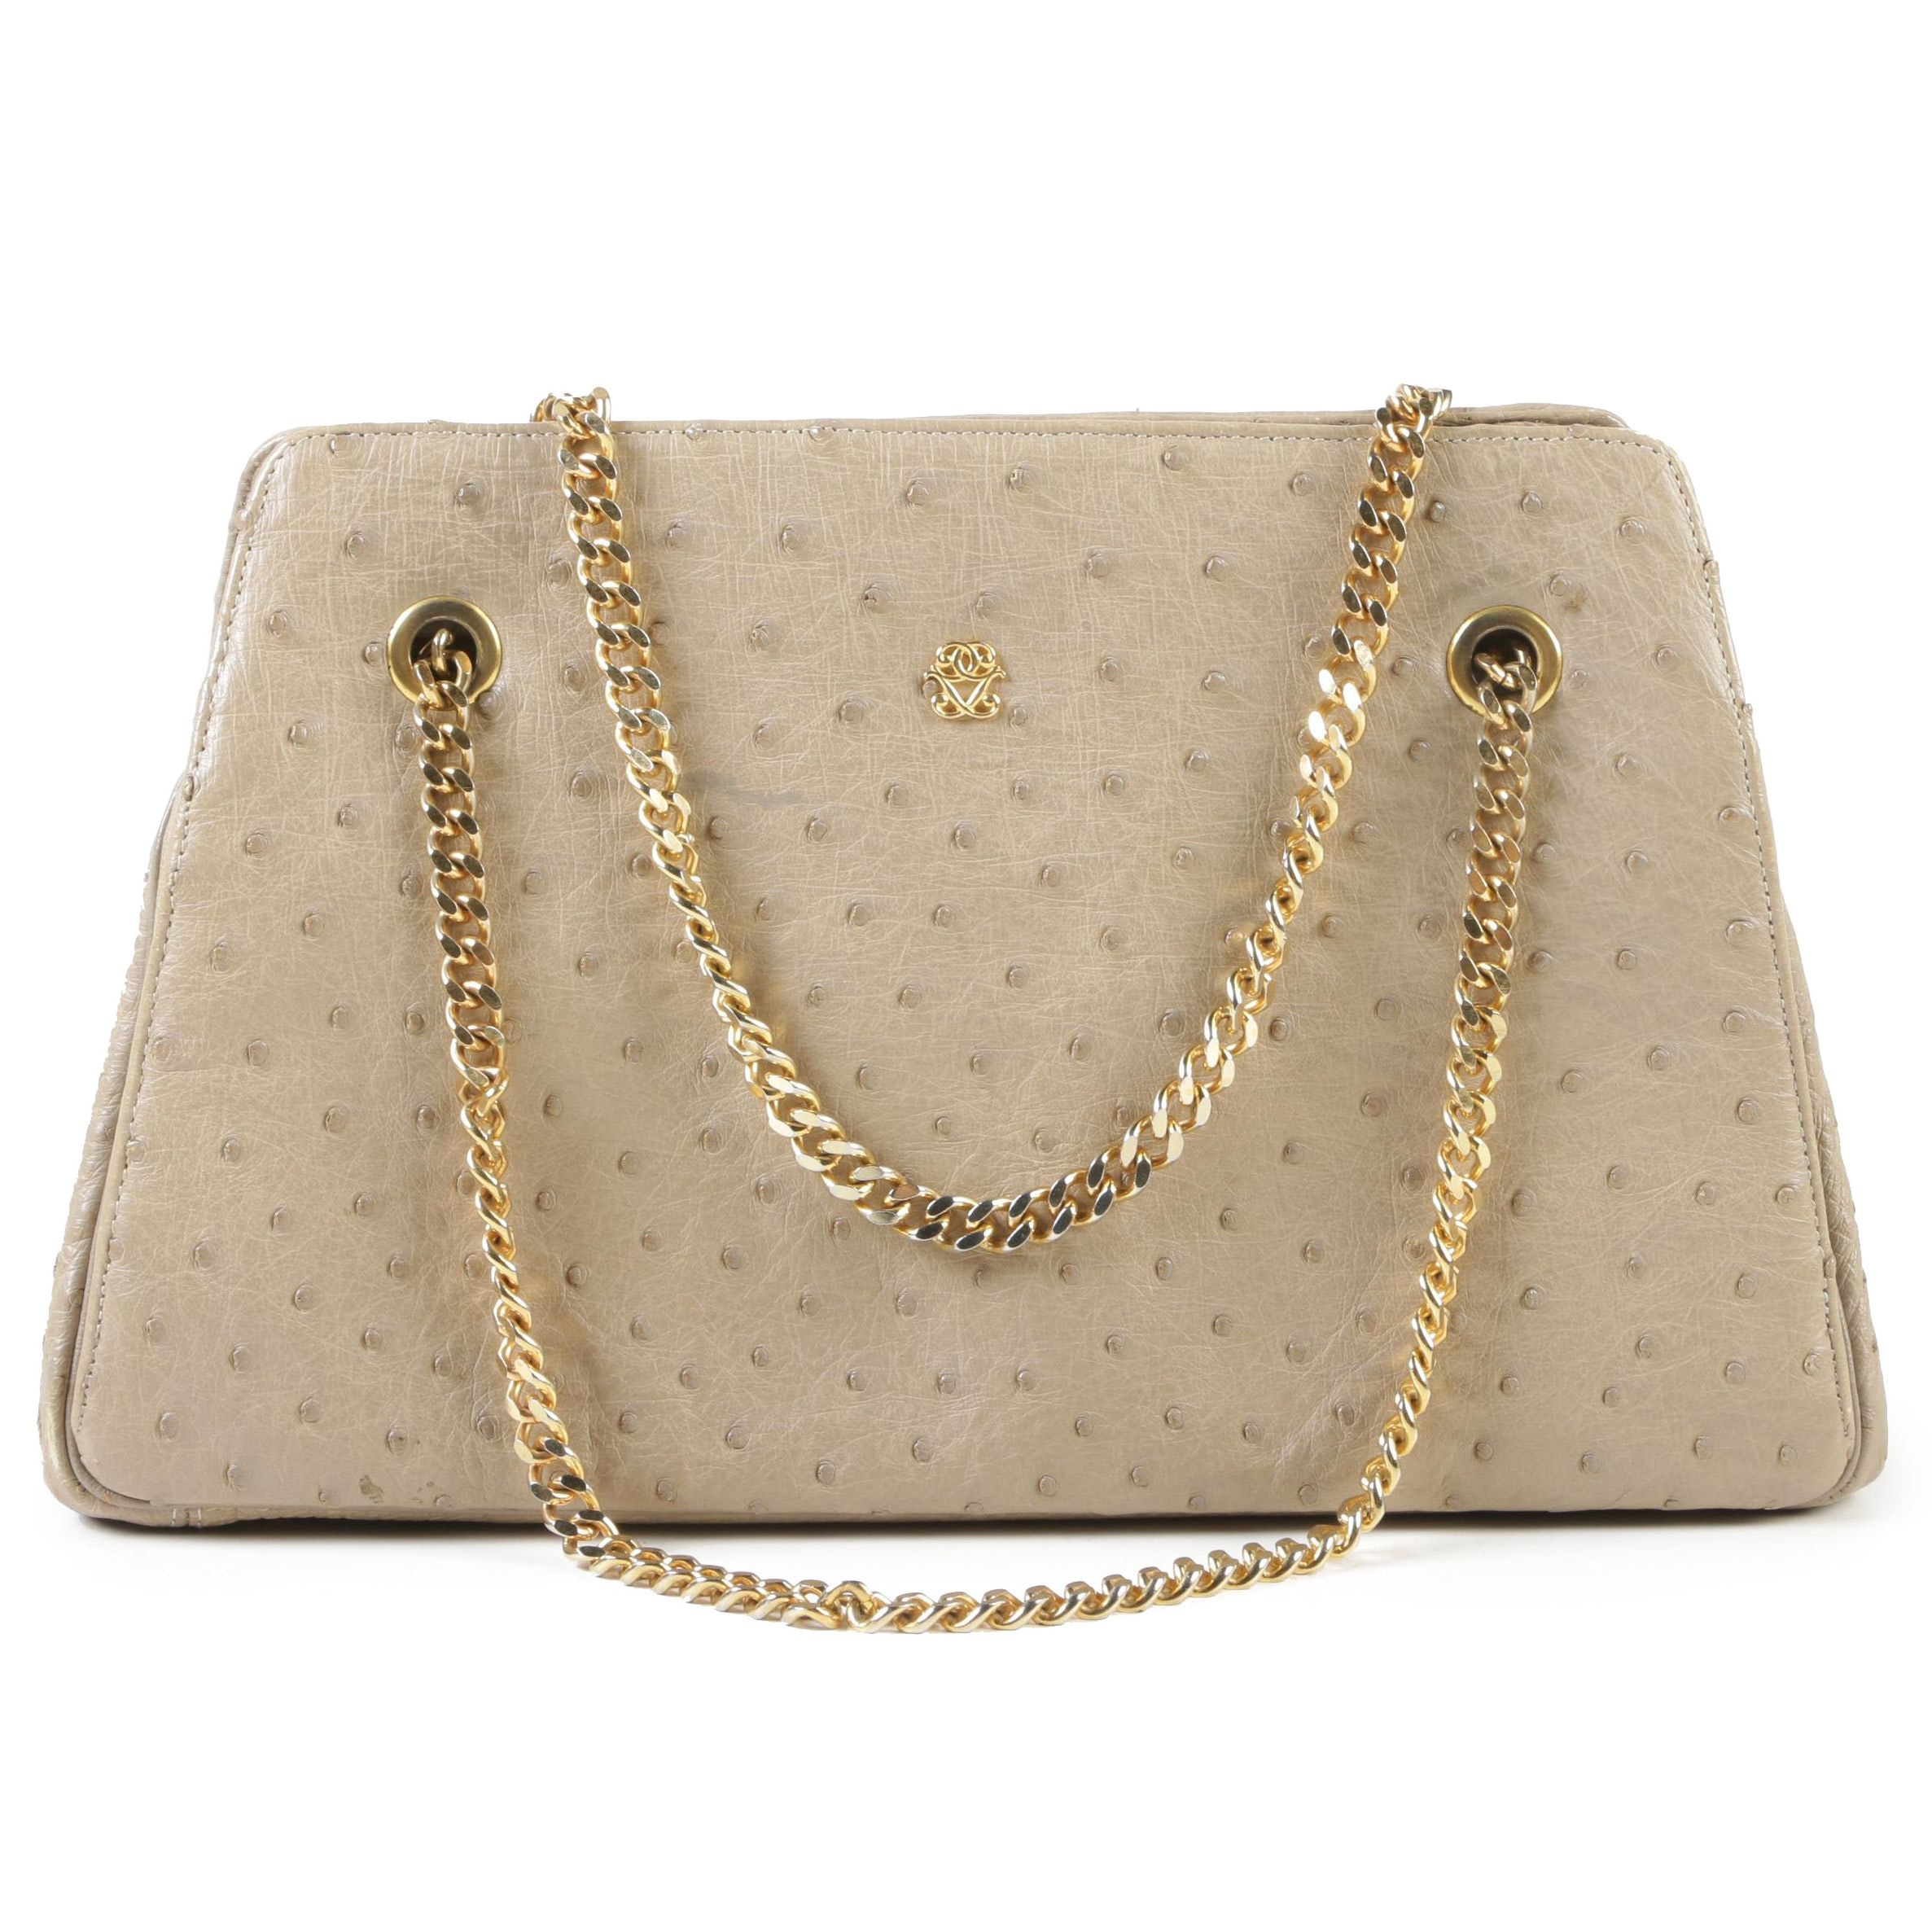 Koret Beige Full Quill Ostrich Skin Handbag with Gold Tone Trim,1960s Vintage